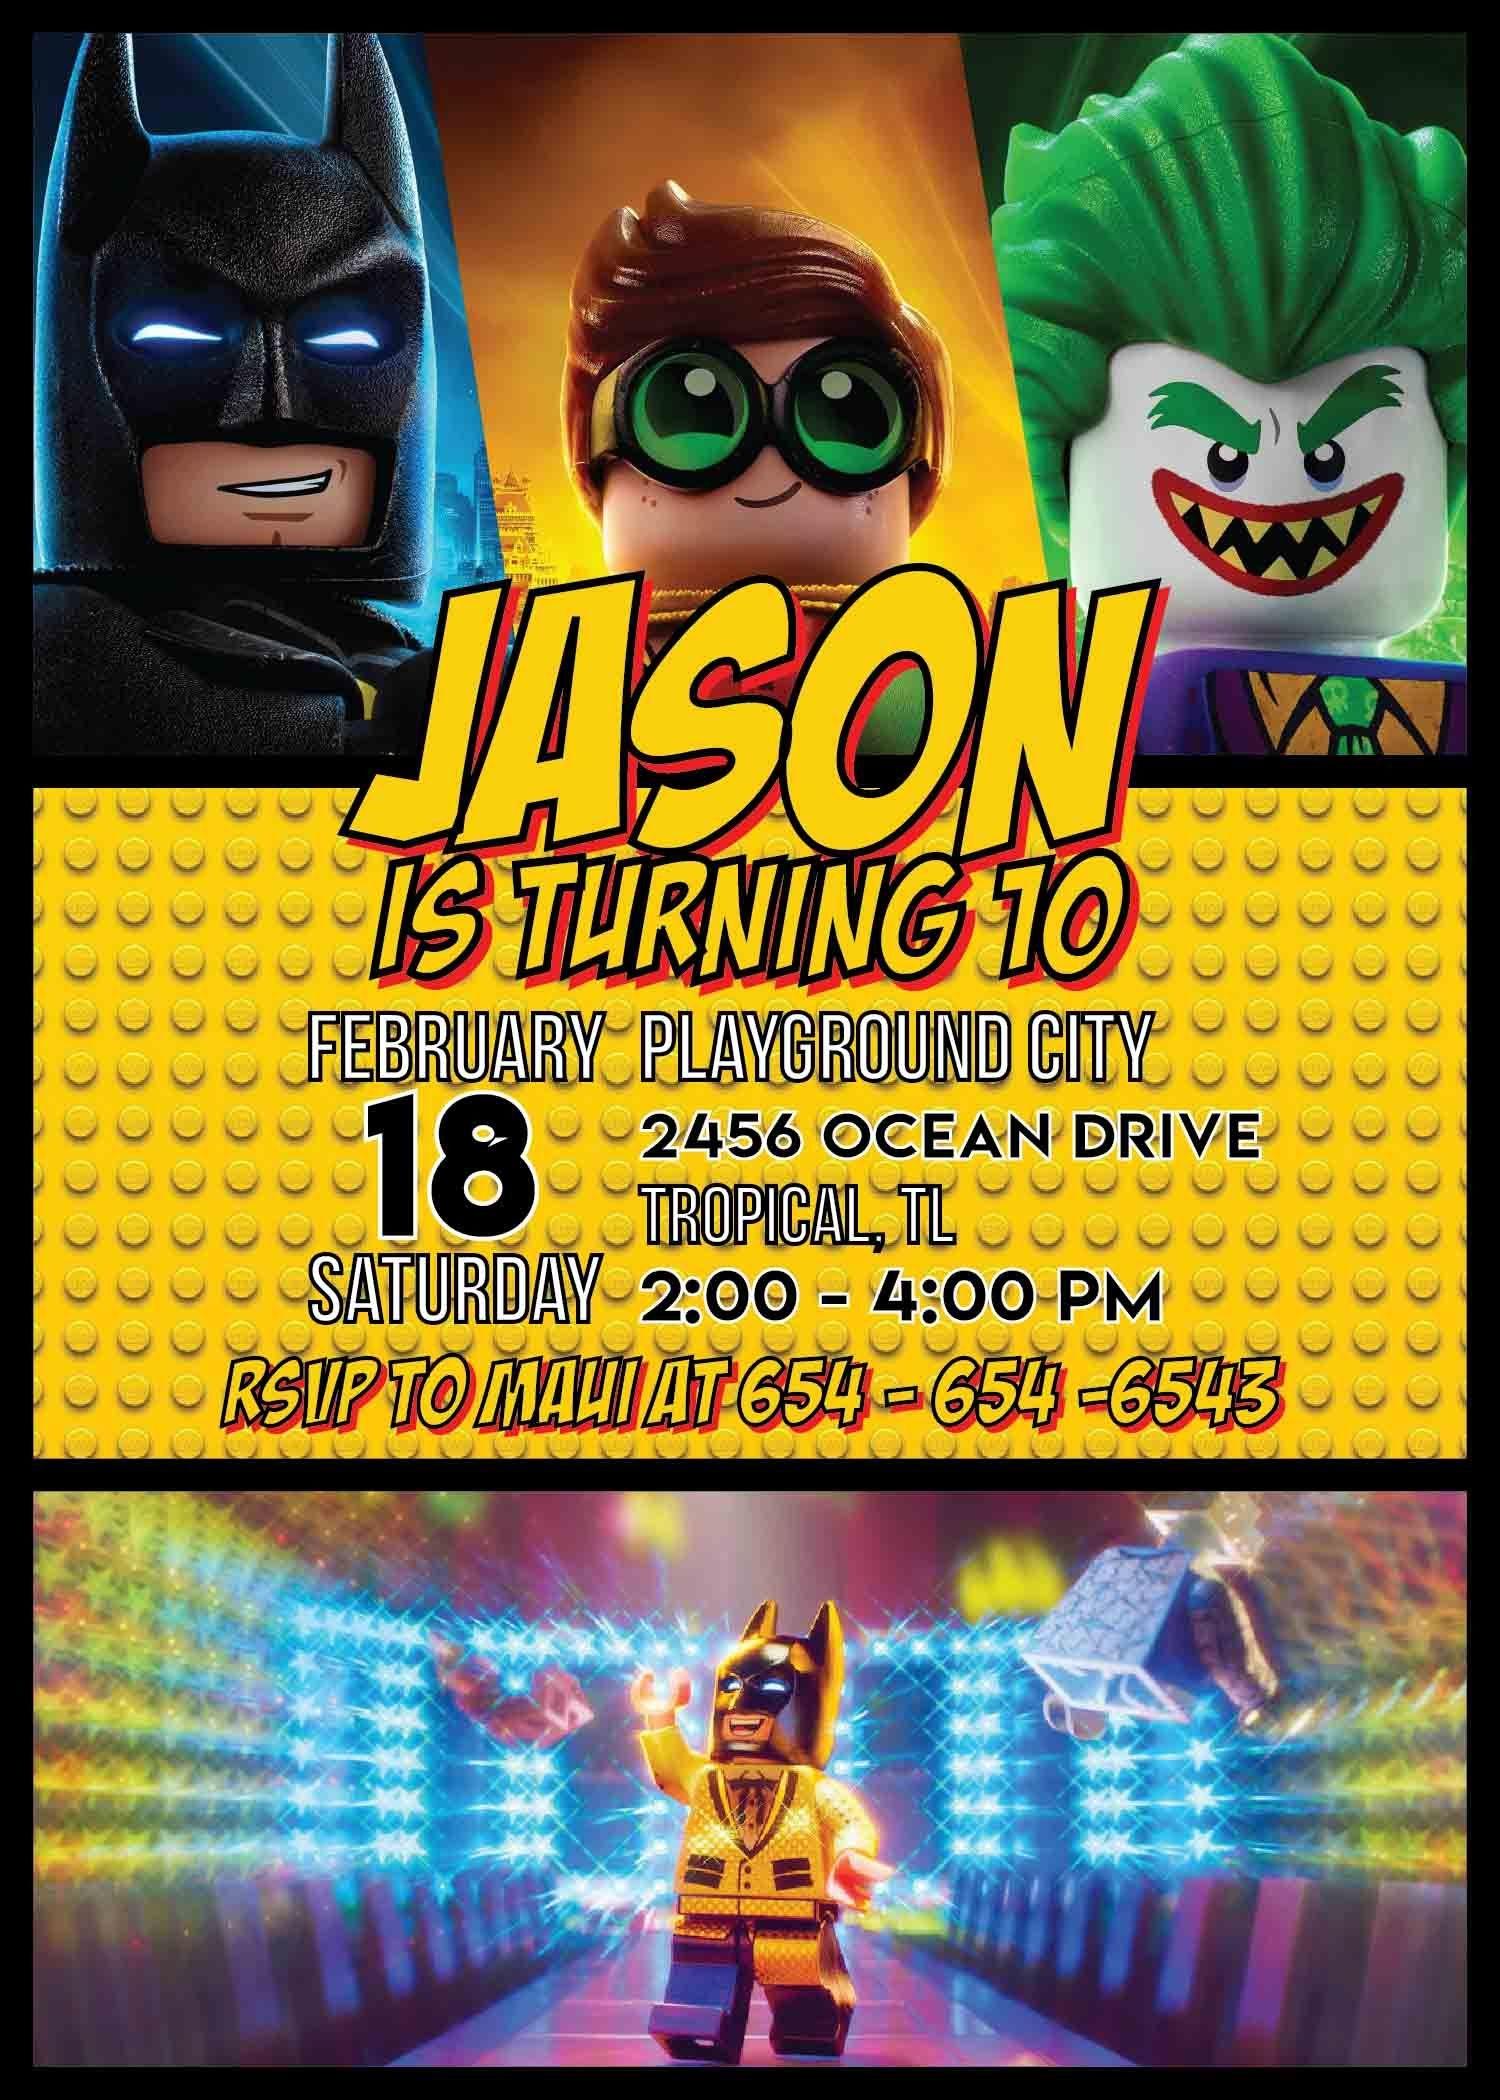 Lego Batman Party Invitation Template In 2019 | Lego Batman Party - Lego Batman Invitations Free Printable